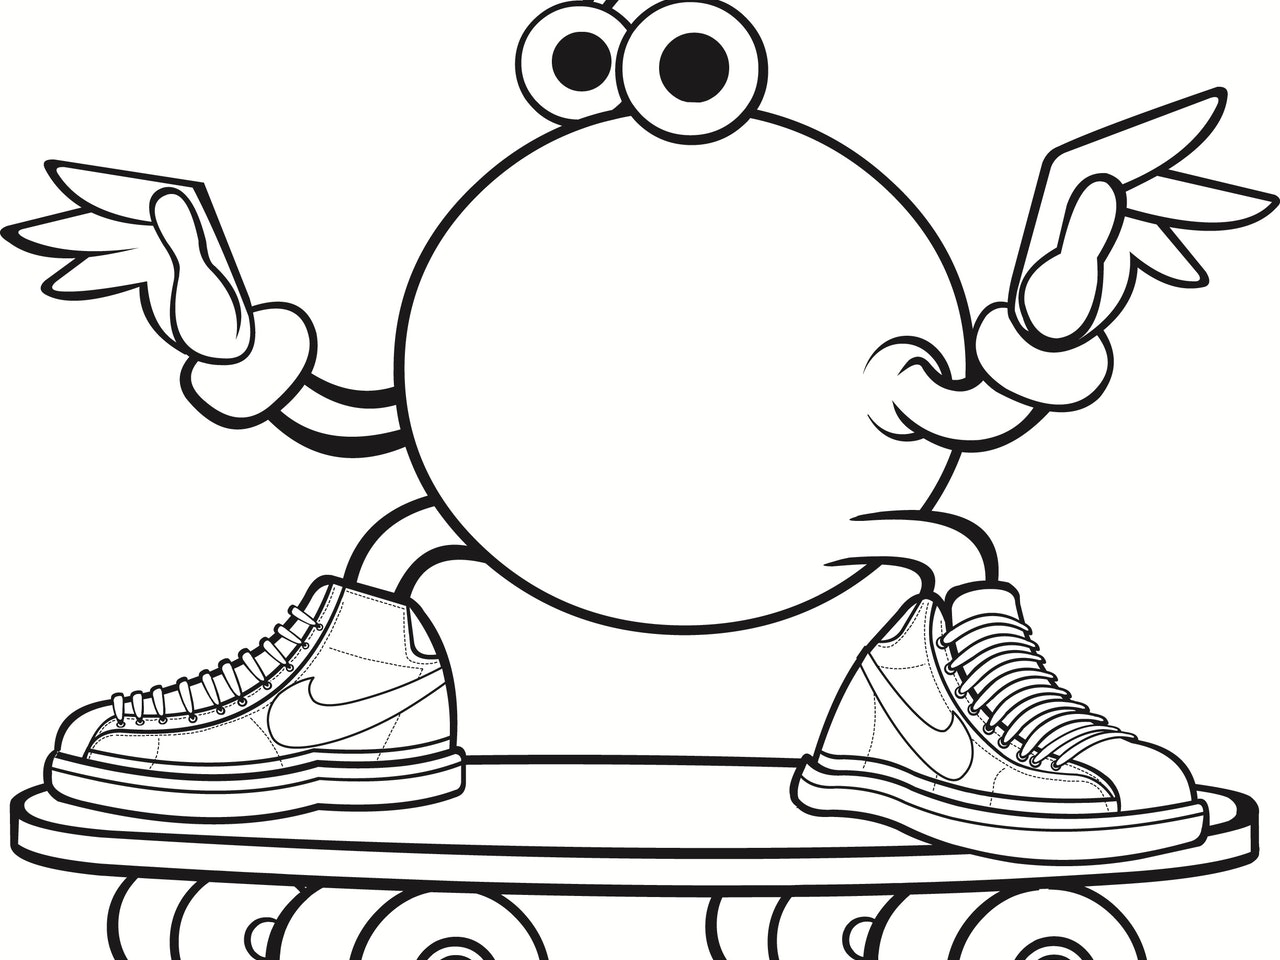 skateboard trainers sneakers fun friendly cartoon tattoo  logo icon emoji linework simple basic emoticon mascot avatar sprite animation anthropomorphic character urban vinyl toy street art  pictoplasma graffiti graff